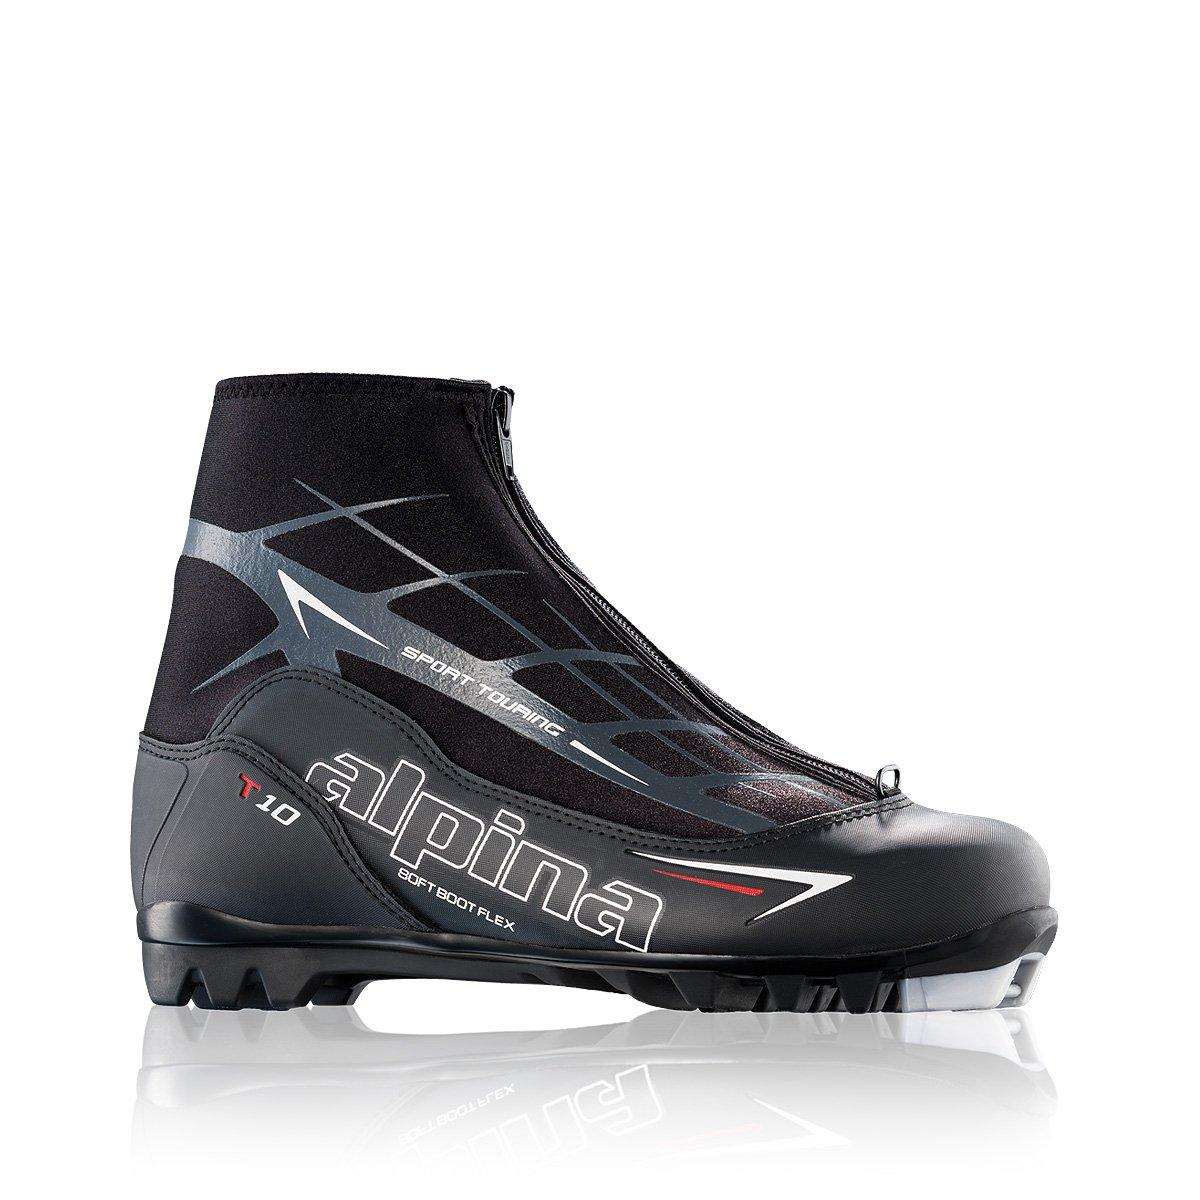 Alpina T10 Nordic Ski Boots